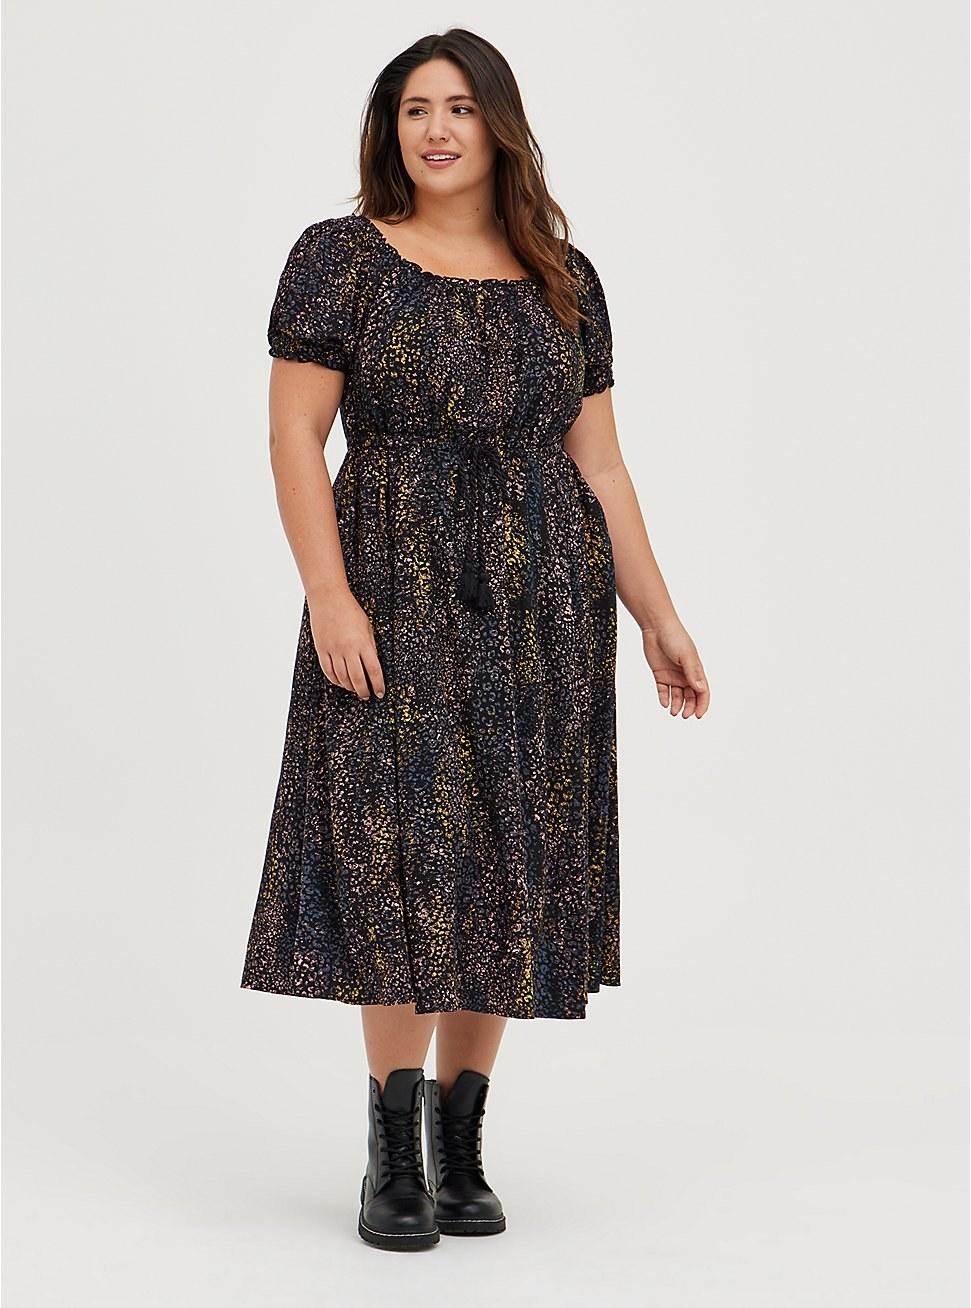 model wearing the black animal-print dress